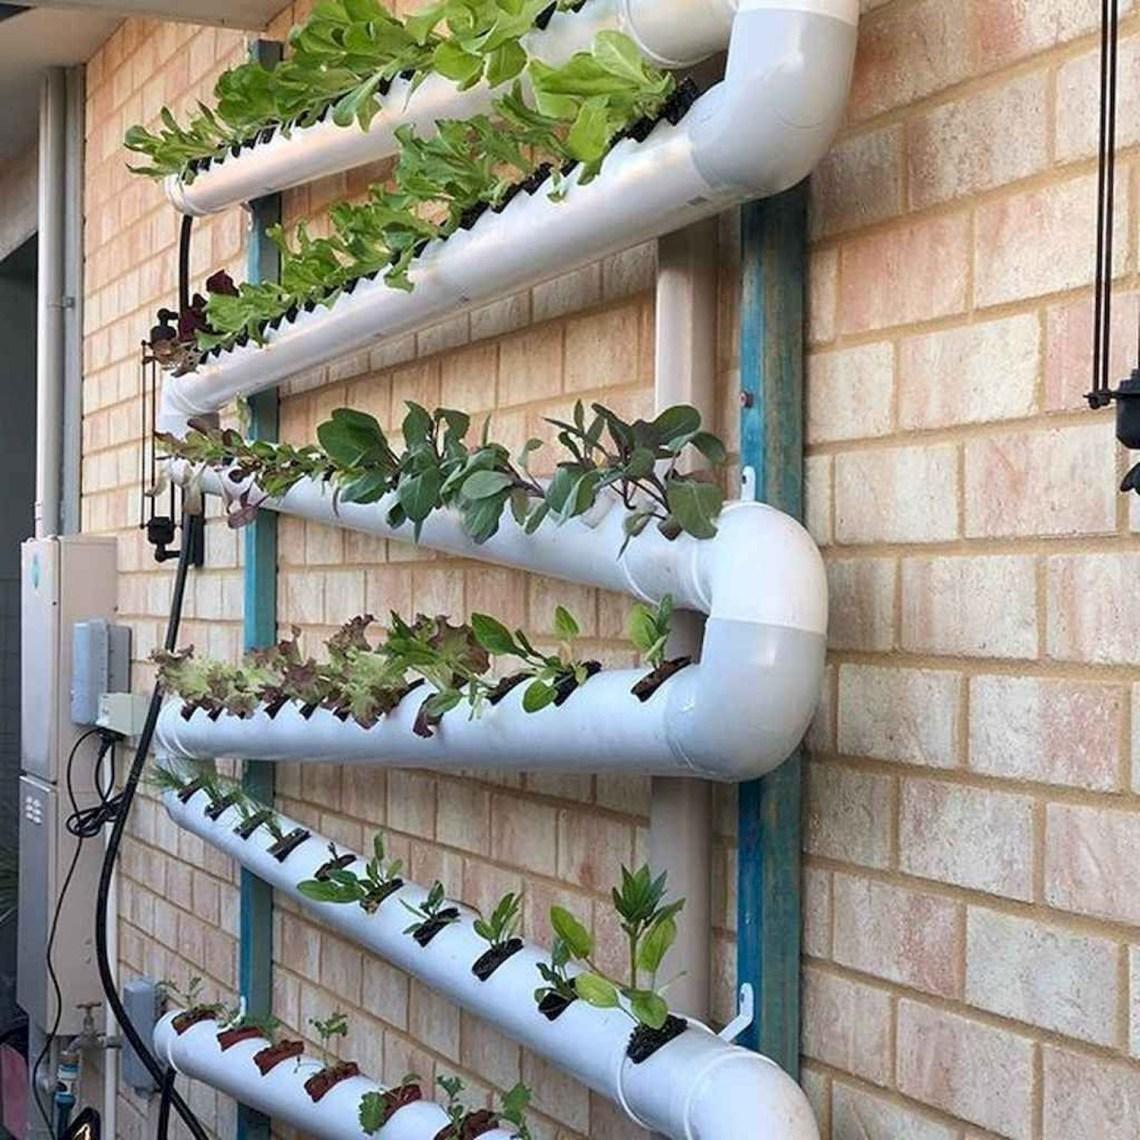 Indoor Gardening With Hydroponics Breakthrough With